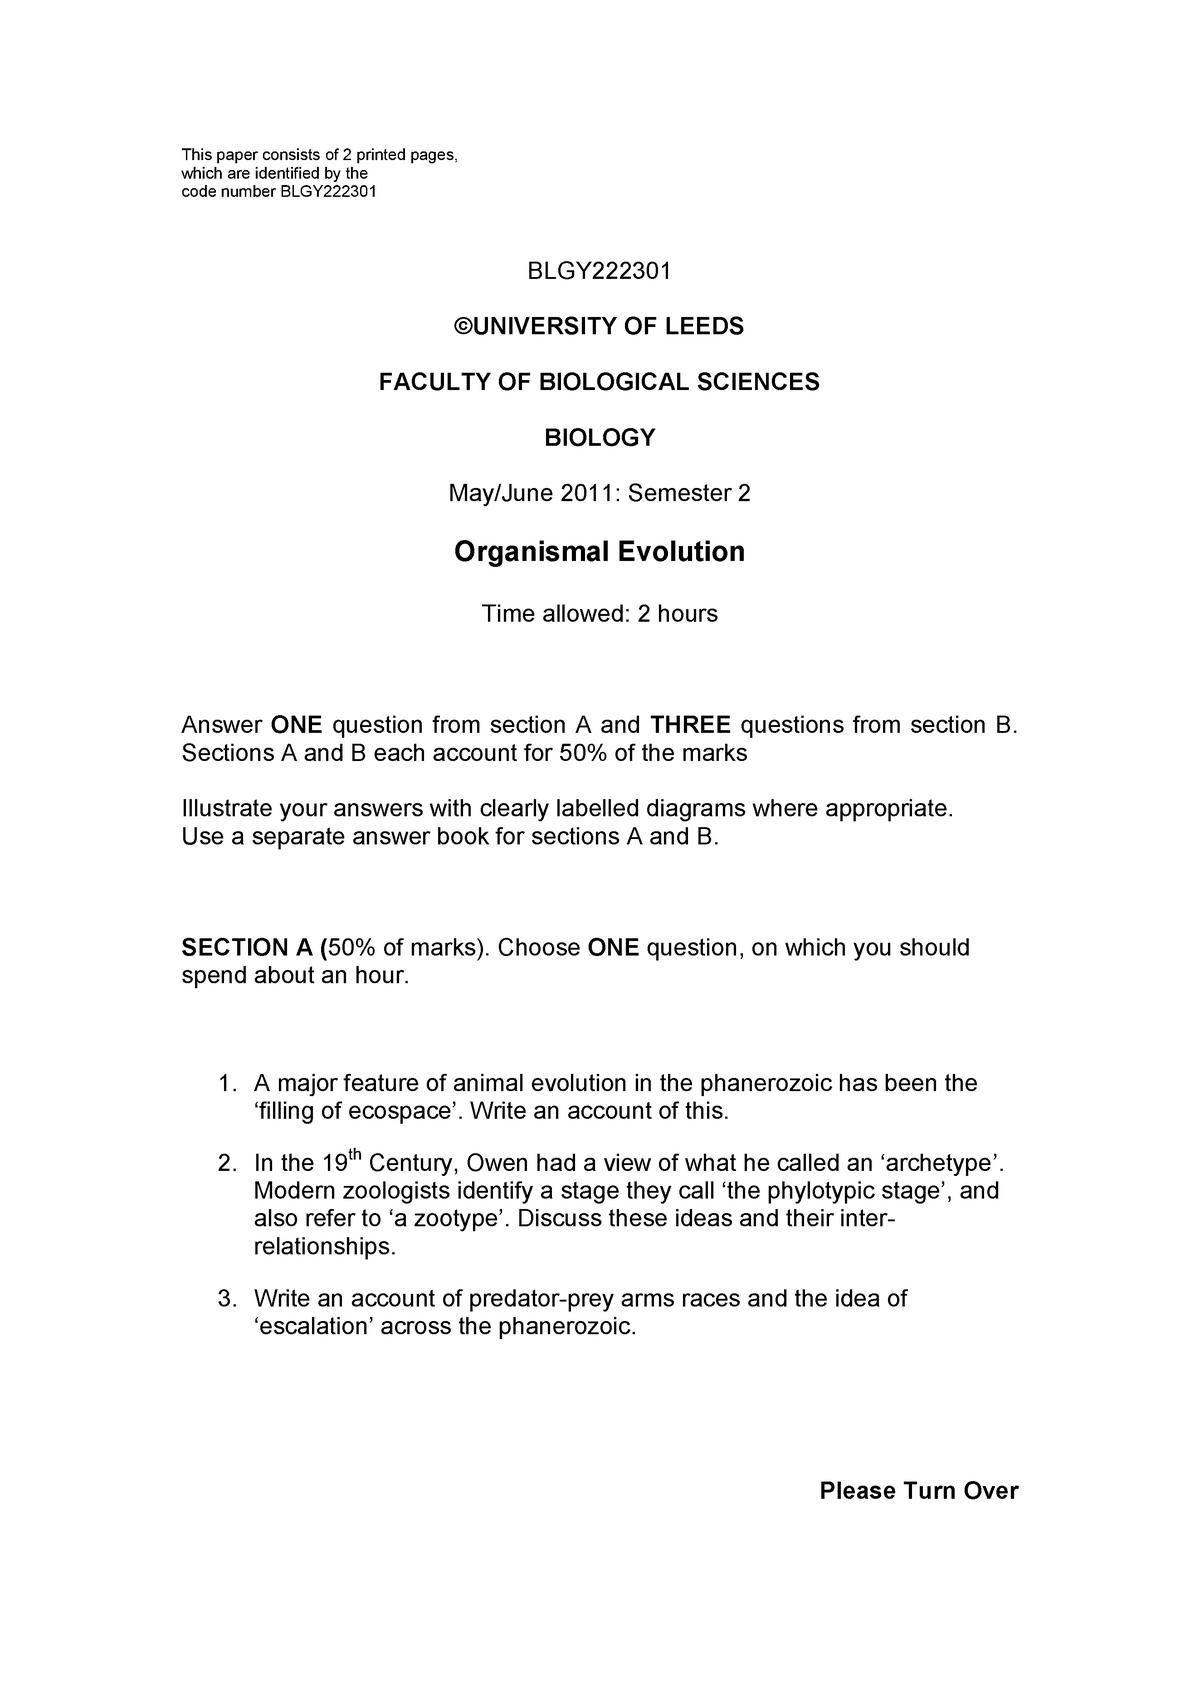 Exam 2011 - BLGY2223: Organismal Evolution - StuDocu